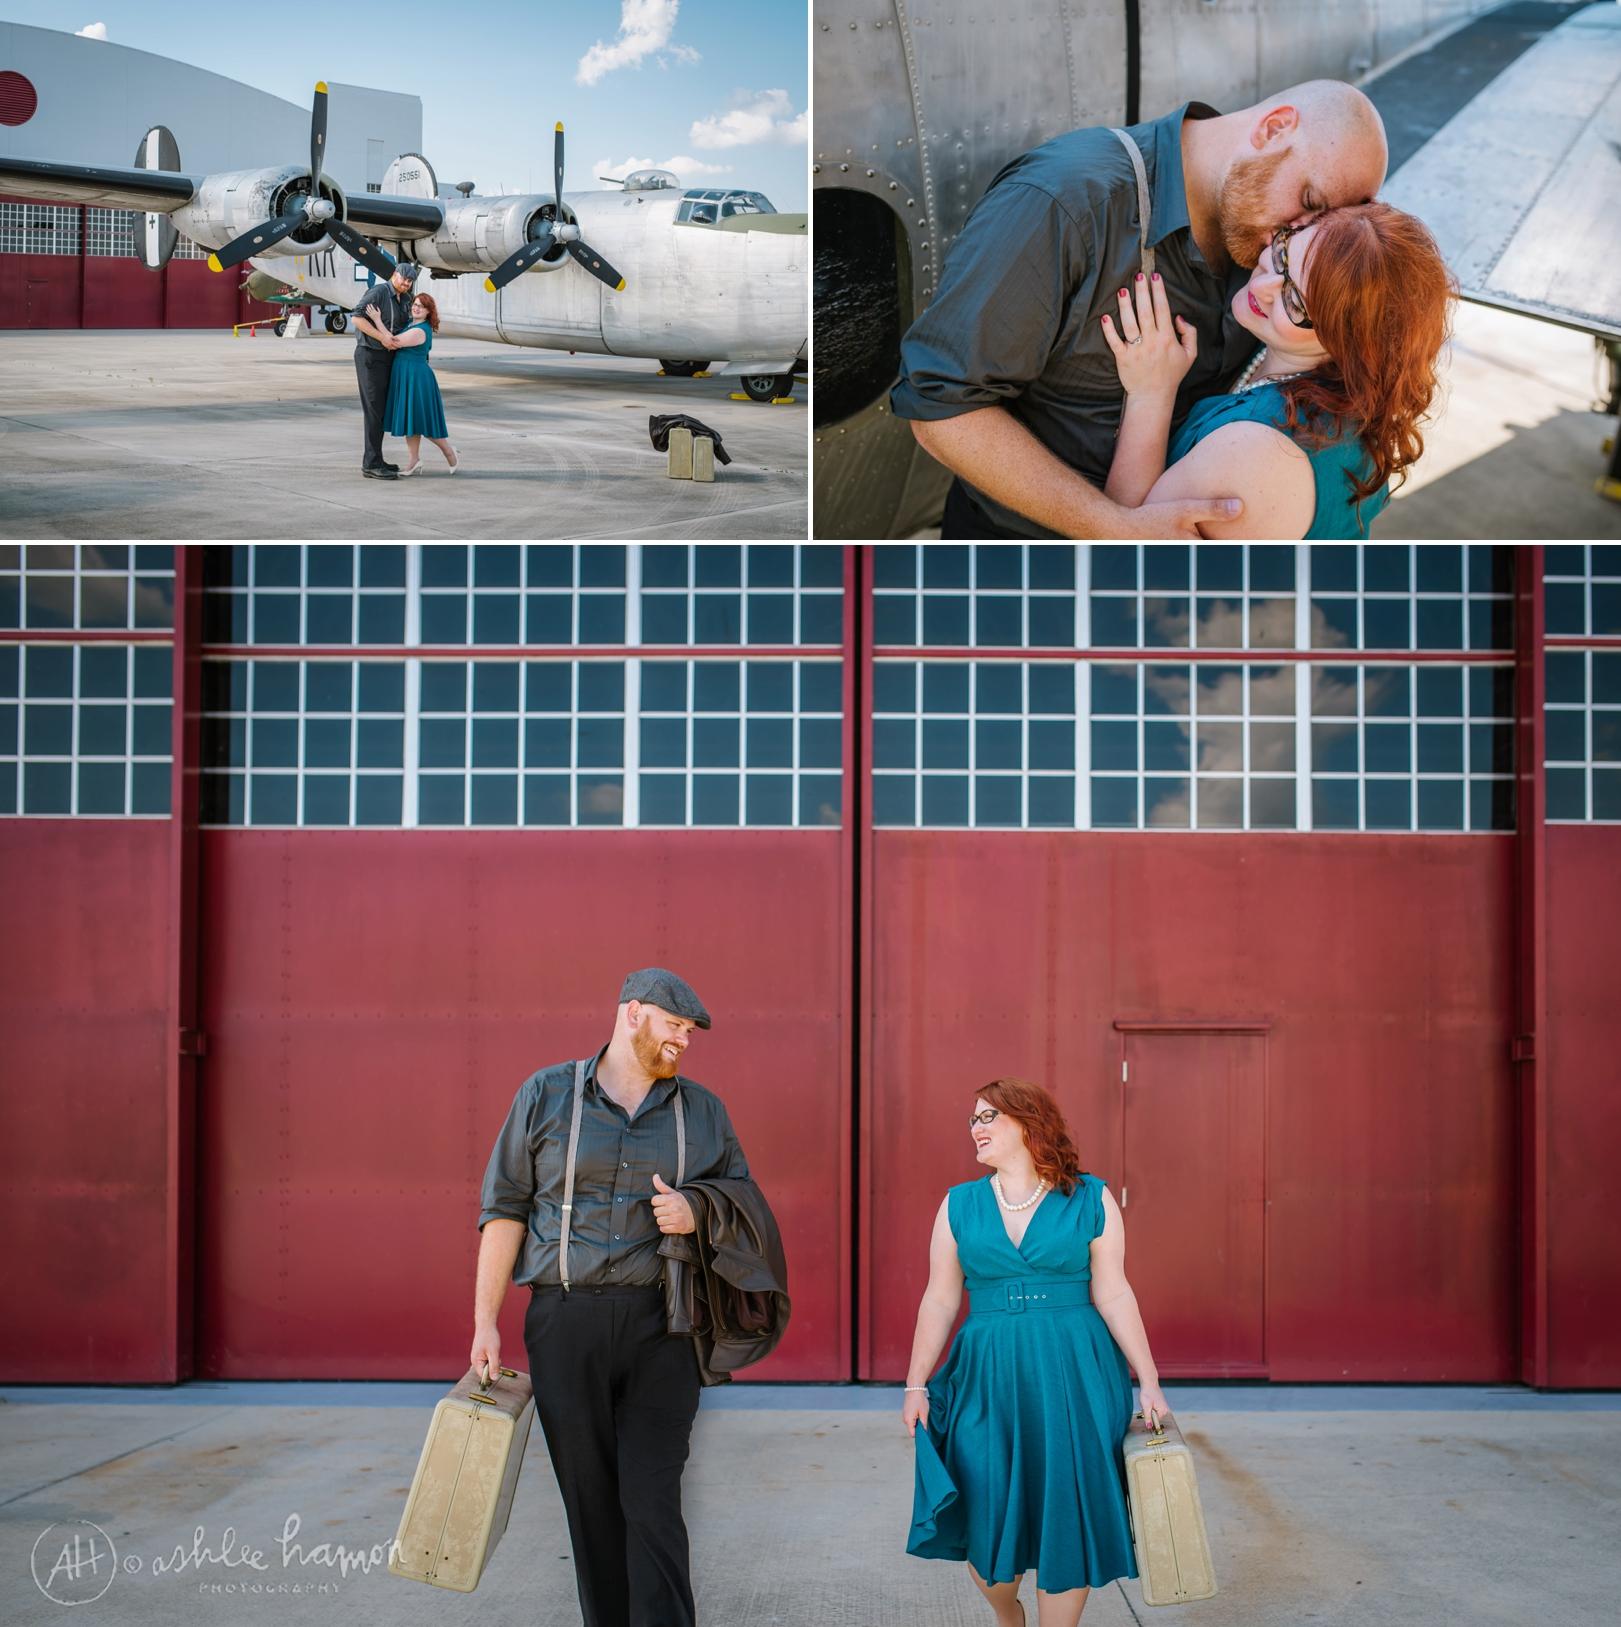 fantasy-of-flight-aviation-themed-engagement-photos-lakeland-florida_0007.jpg